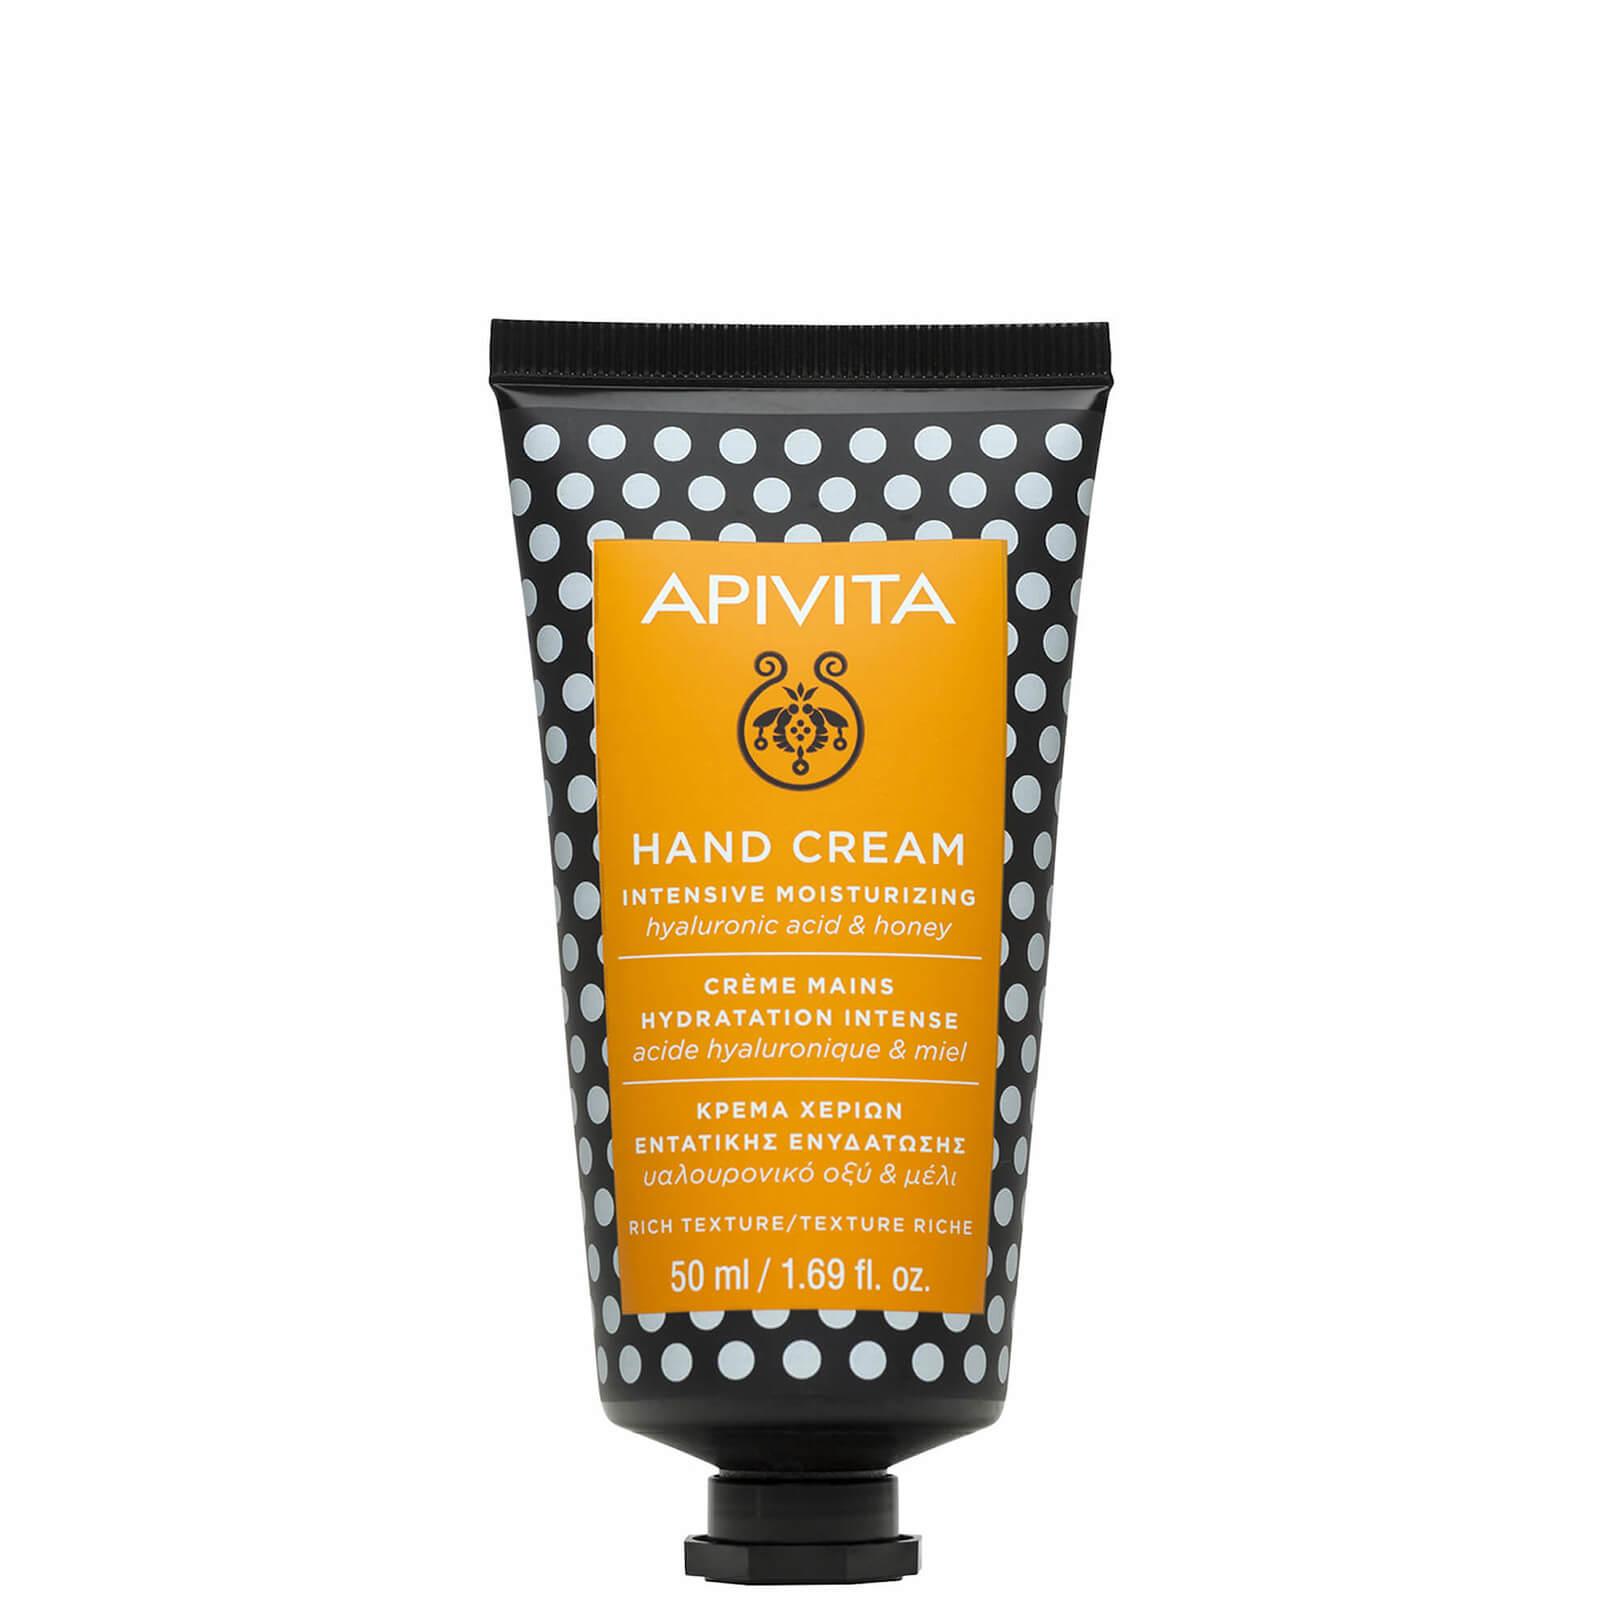 Купить Увлажняющий крем для рук APIVITA Hand Care Intensive Moisturizing Hand Cream - Hyaluronic Acid & Honey 50 мл